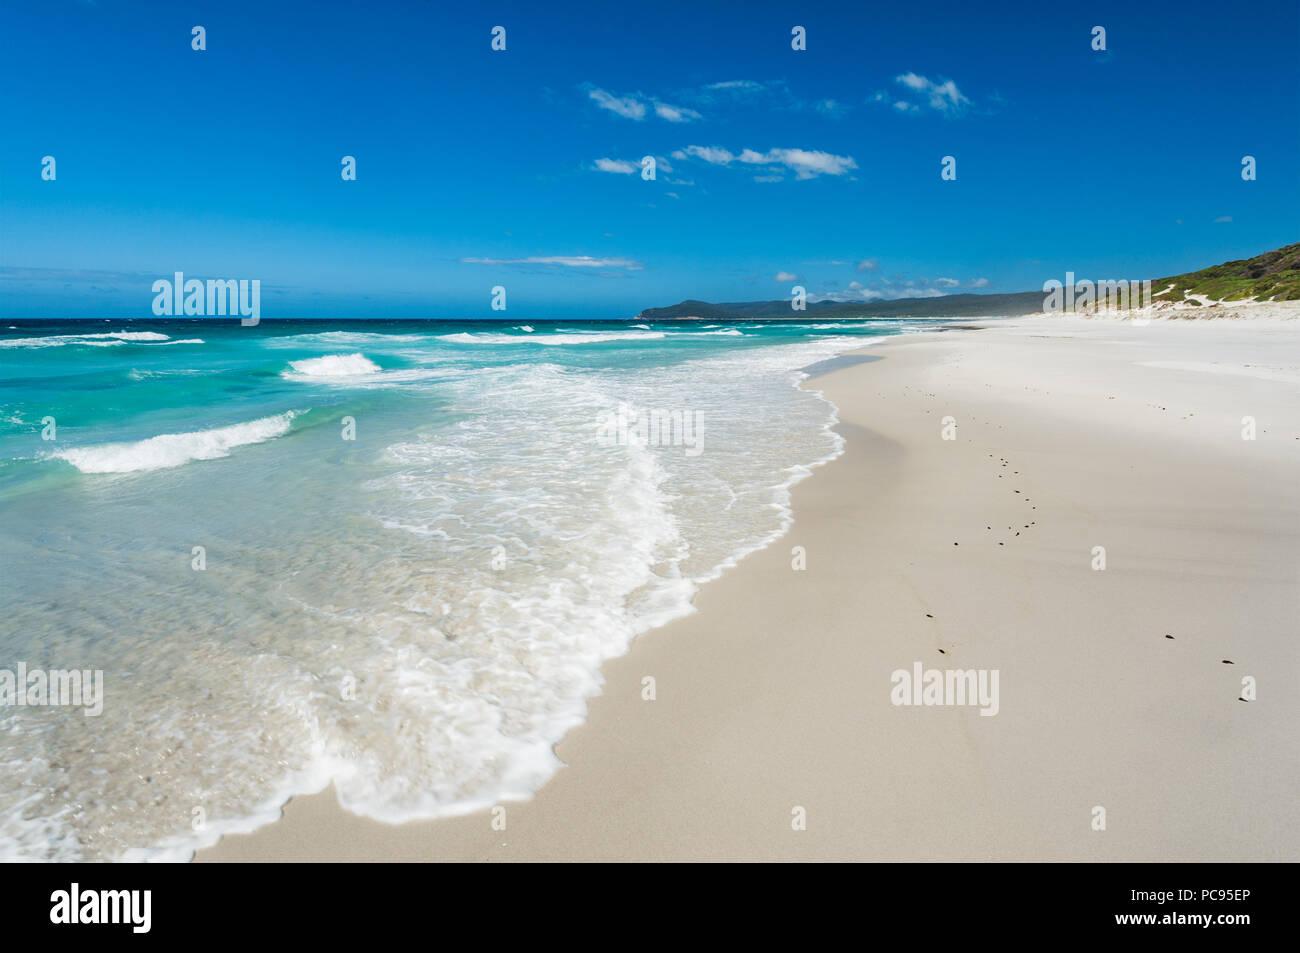 Hermoso paisaje de playa en Friendly playas en Freycinet National Park. Imagen De Stock